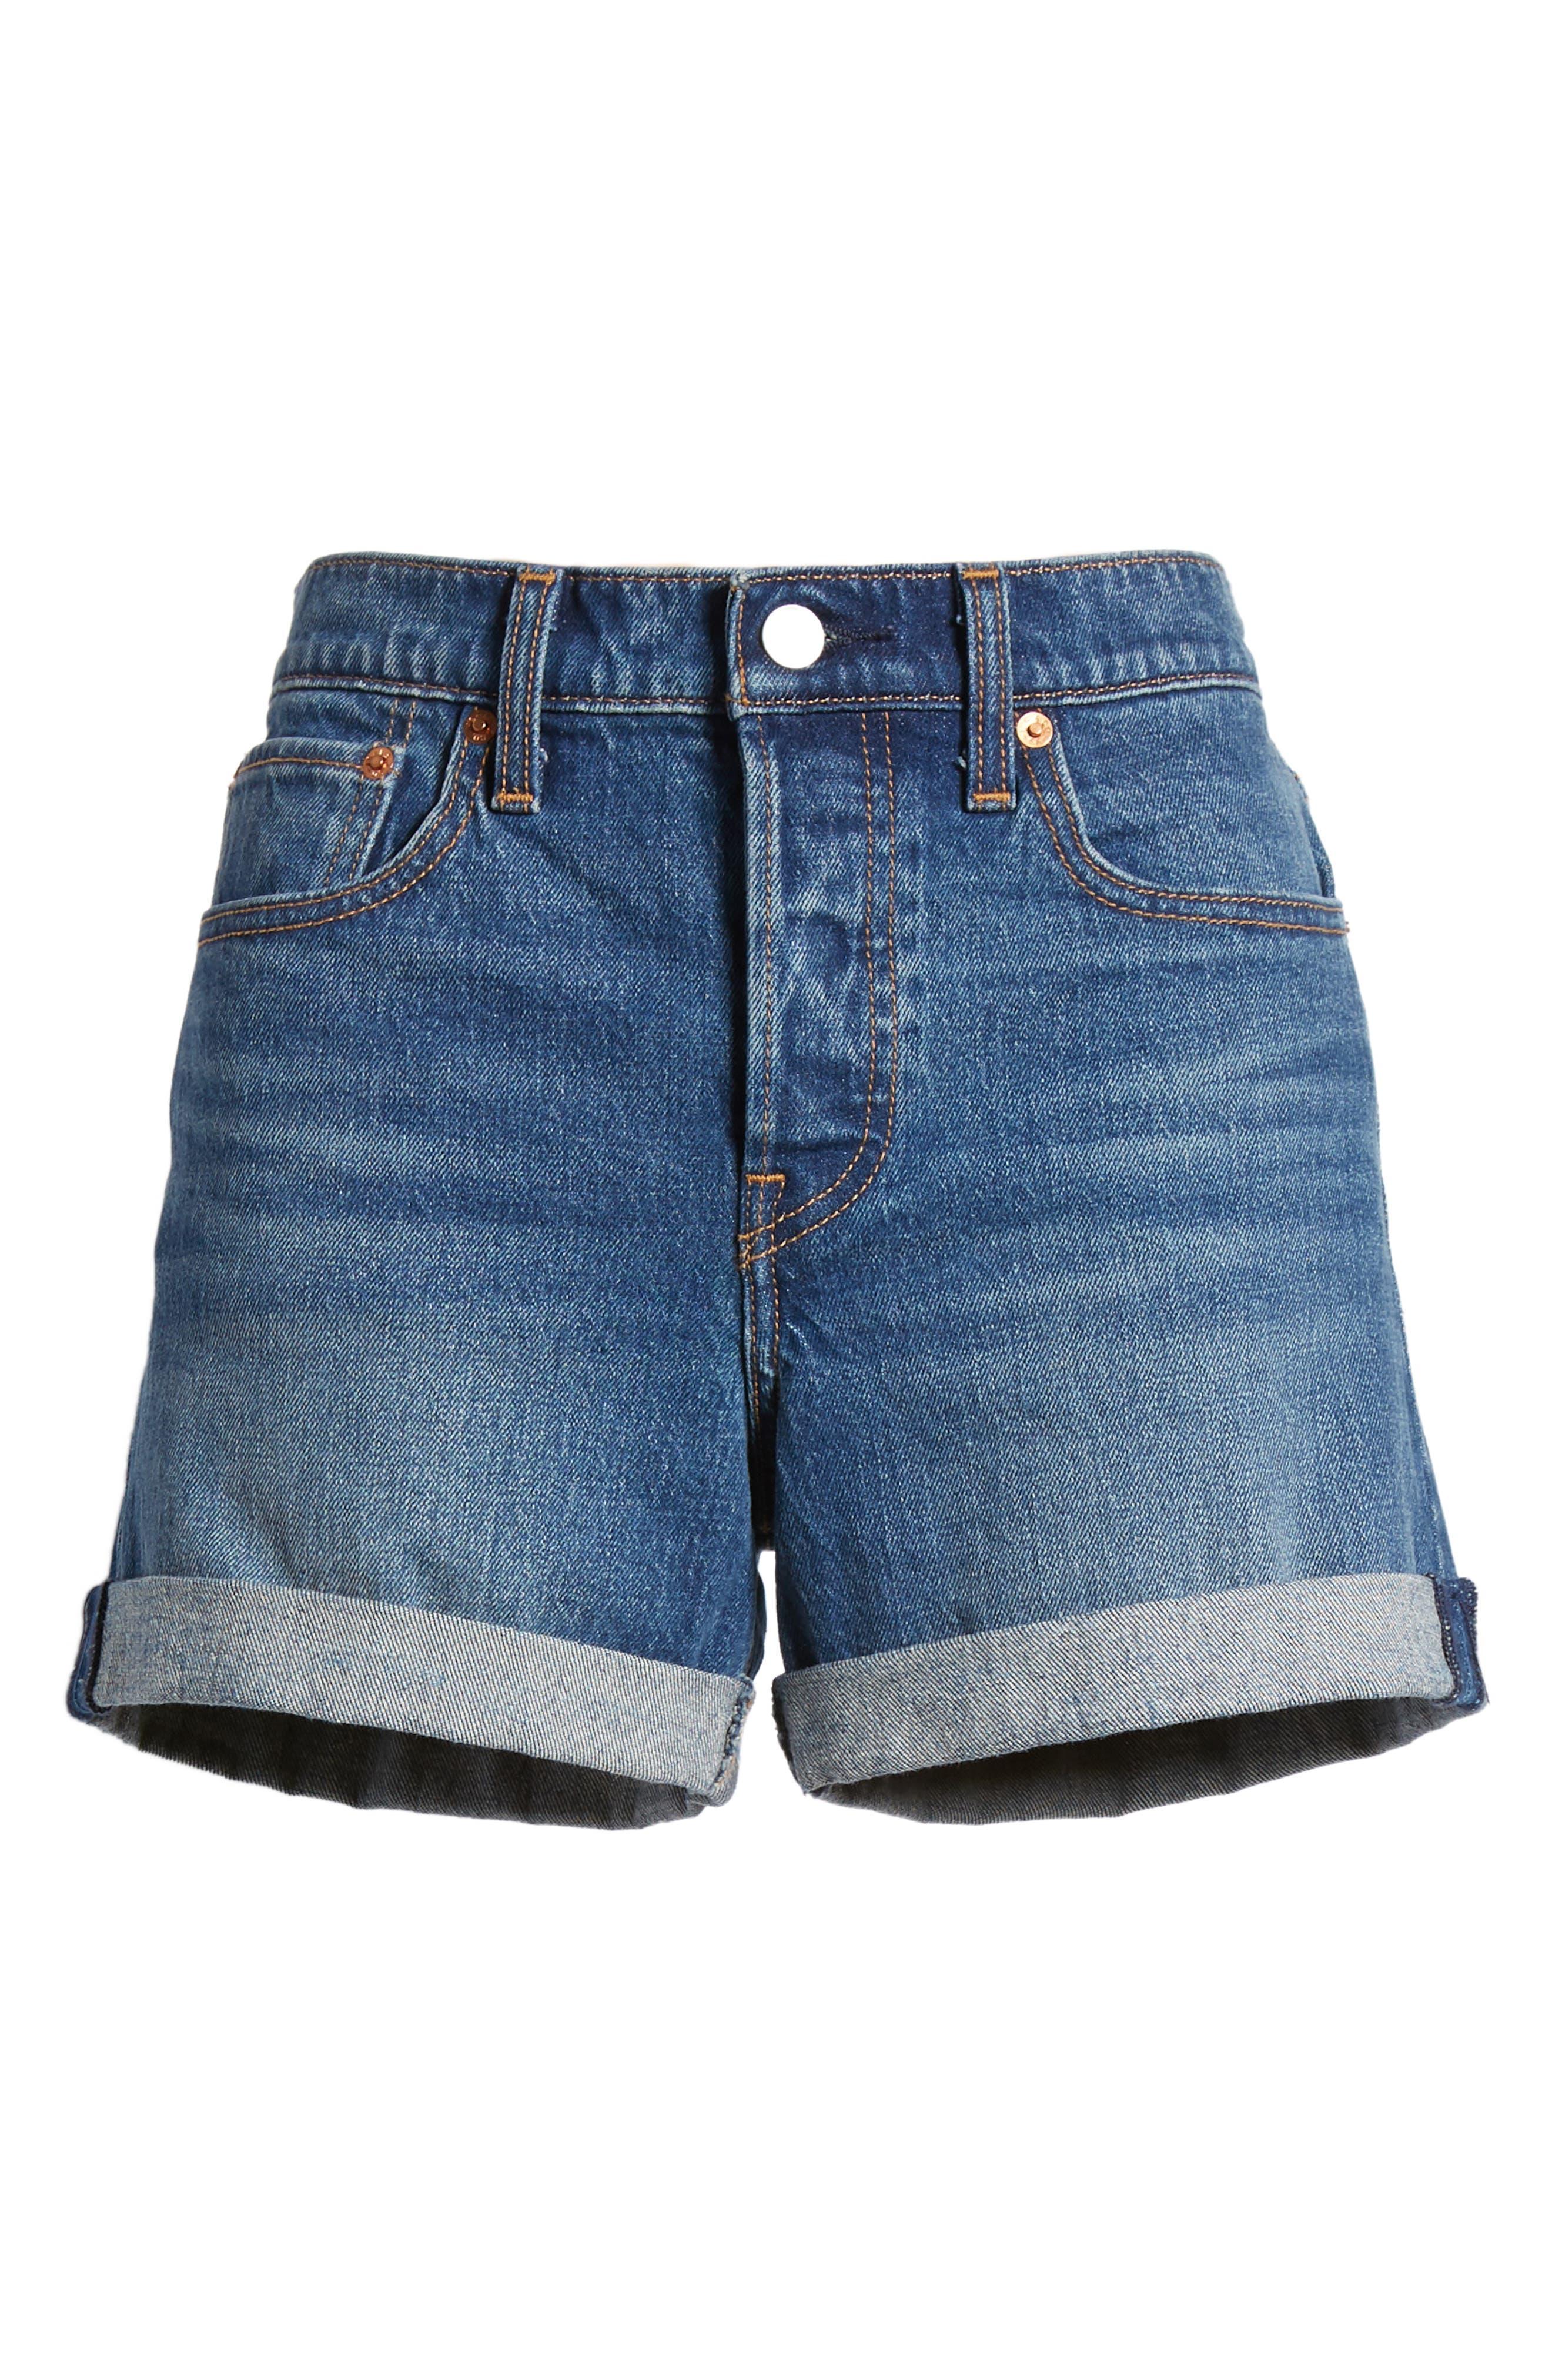 Wedgie Update Denim Shorts,                             Alternate thumbnail 7, color,                             401